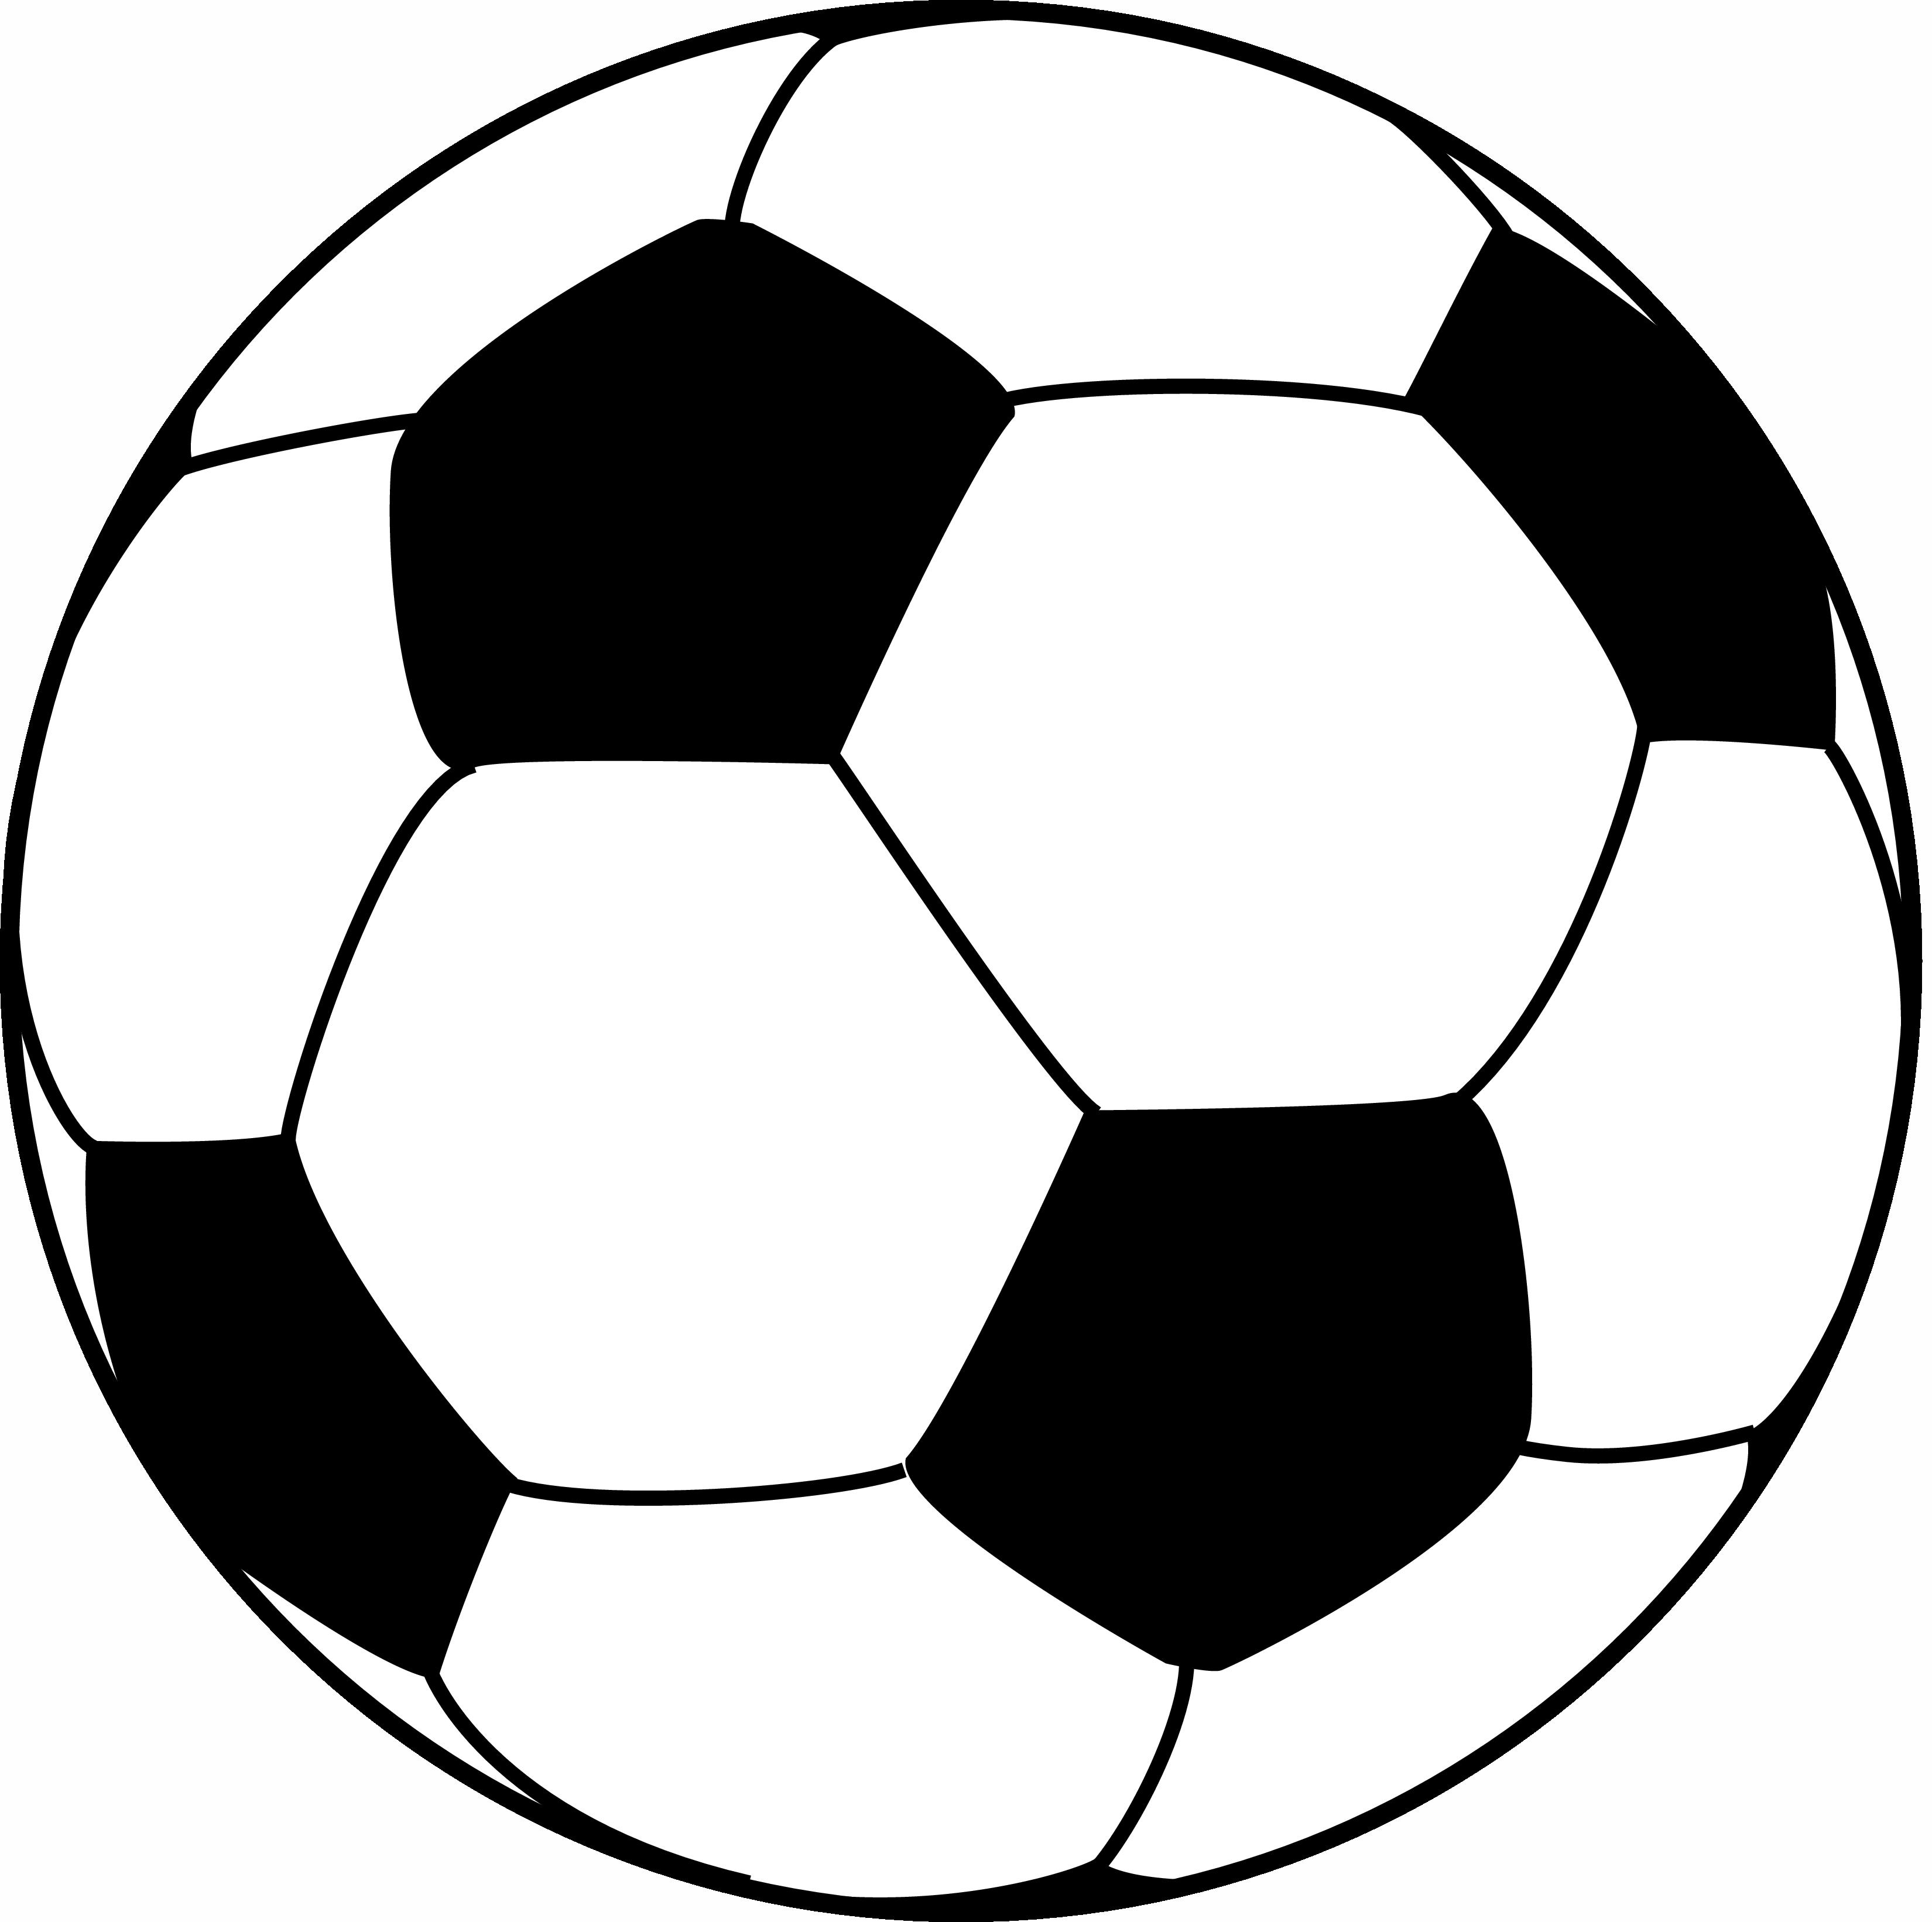 Football Drawing Template | Soccer Ball Drawing Template Ashlee Club Tk